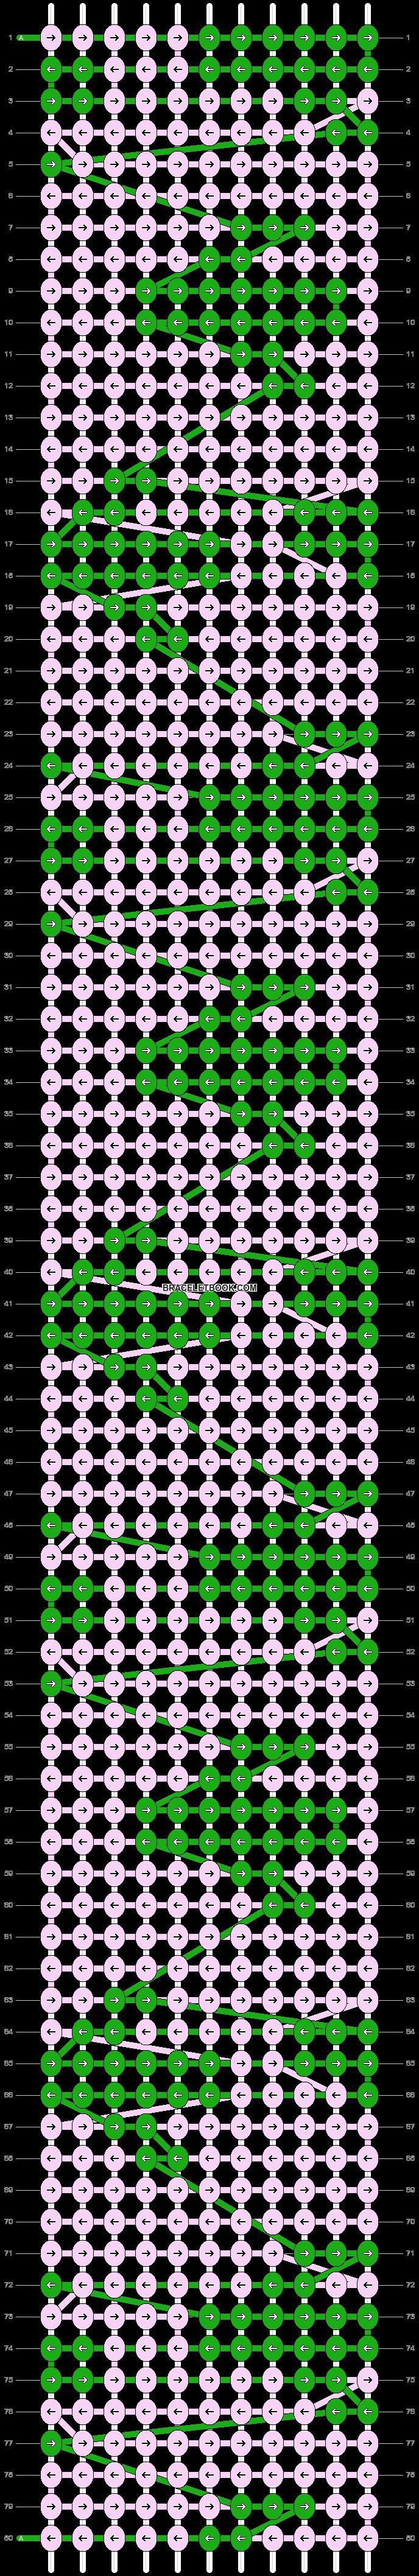 Alpha Pattern #21041 added by yukisut